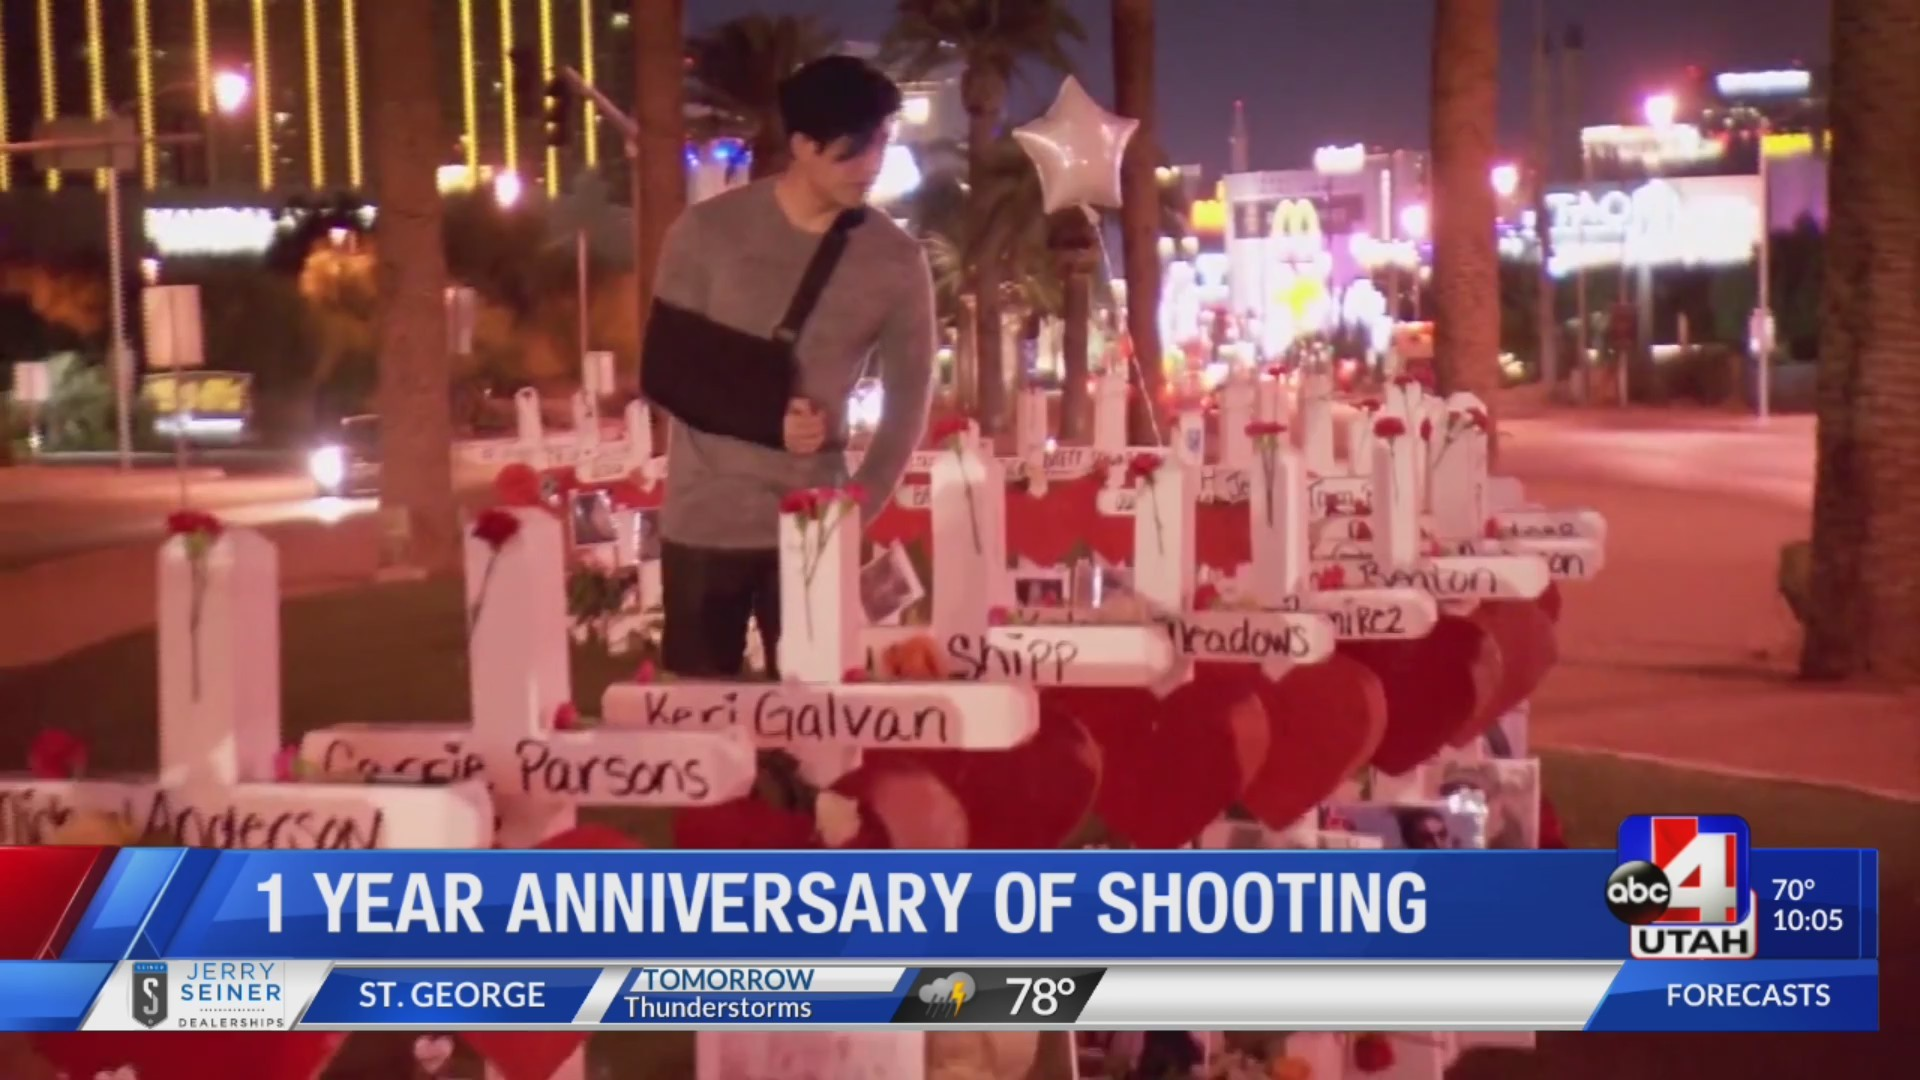 Vegas_Shooting_Anniversary_0_20181002045108